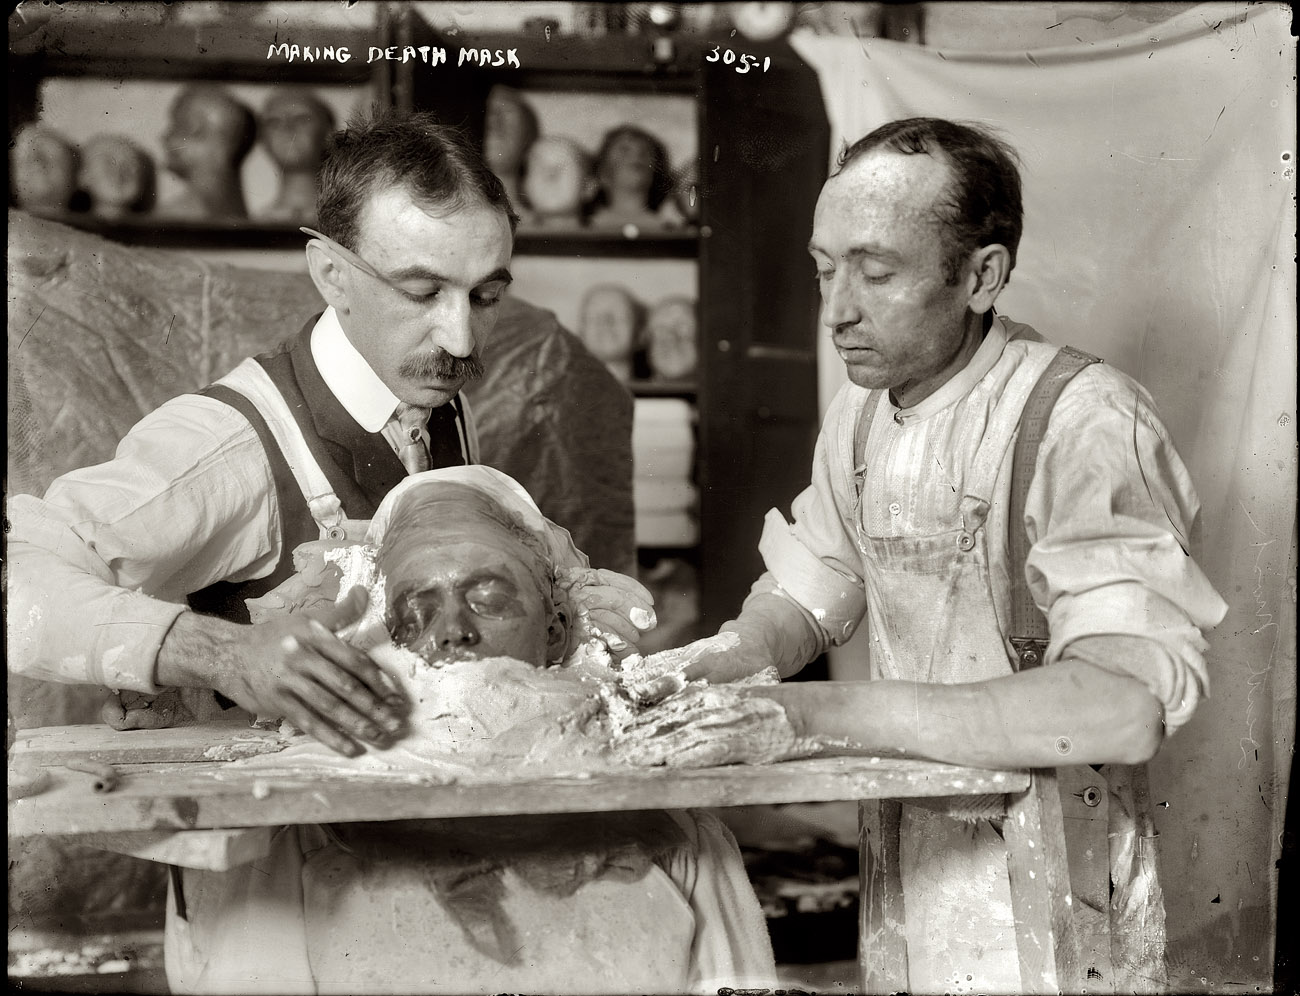 New York circa 1908. Making a plaster death mask.